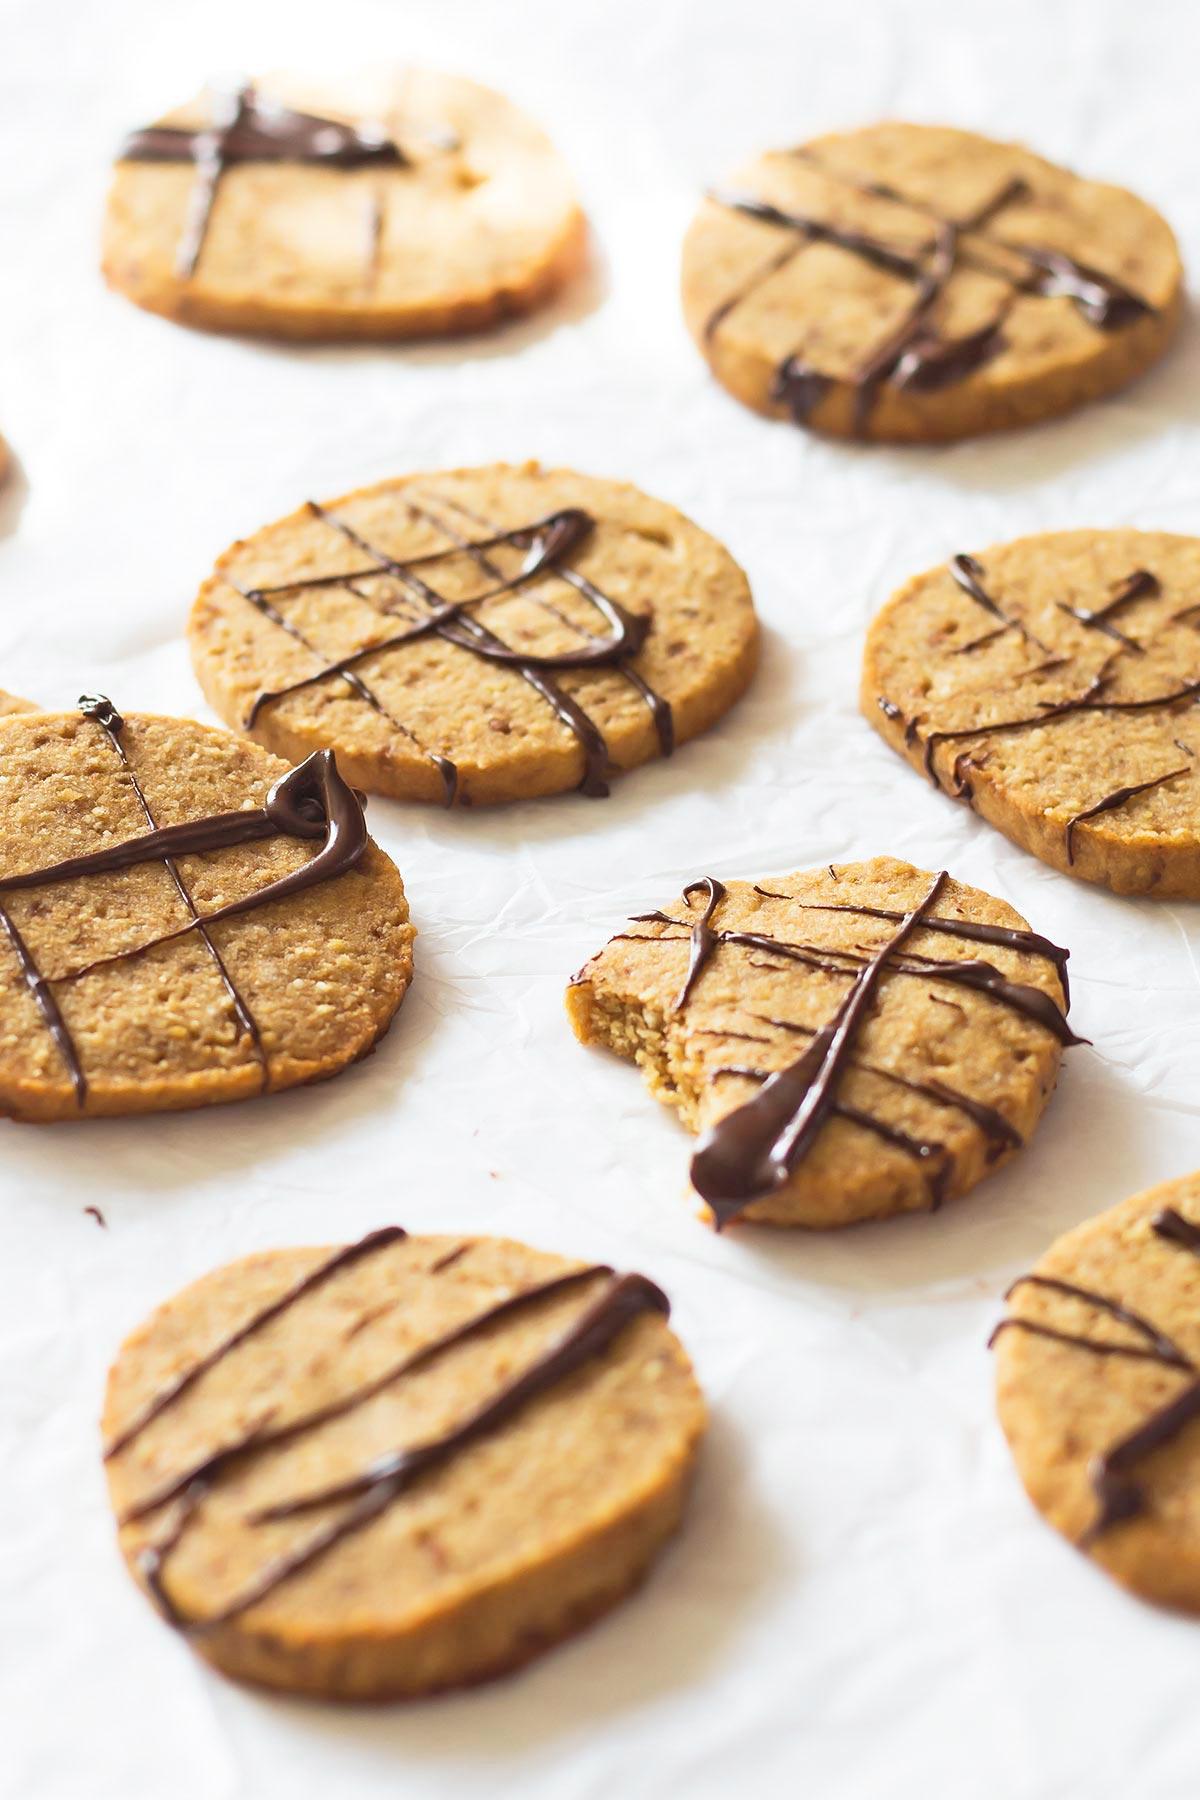 Coconut Oil Dark Chocolate Chip Cookies